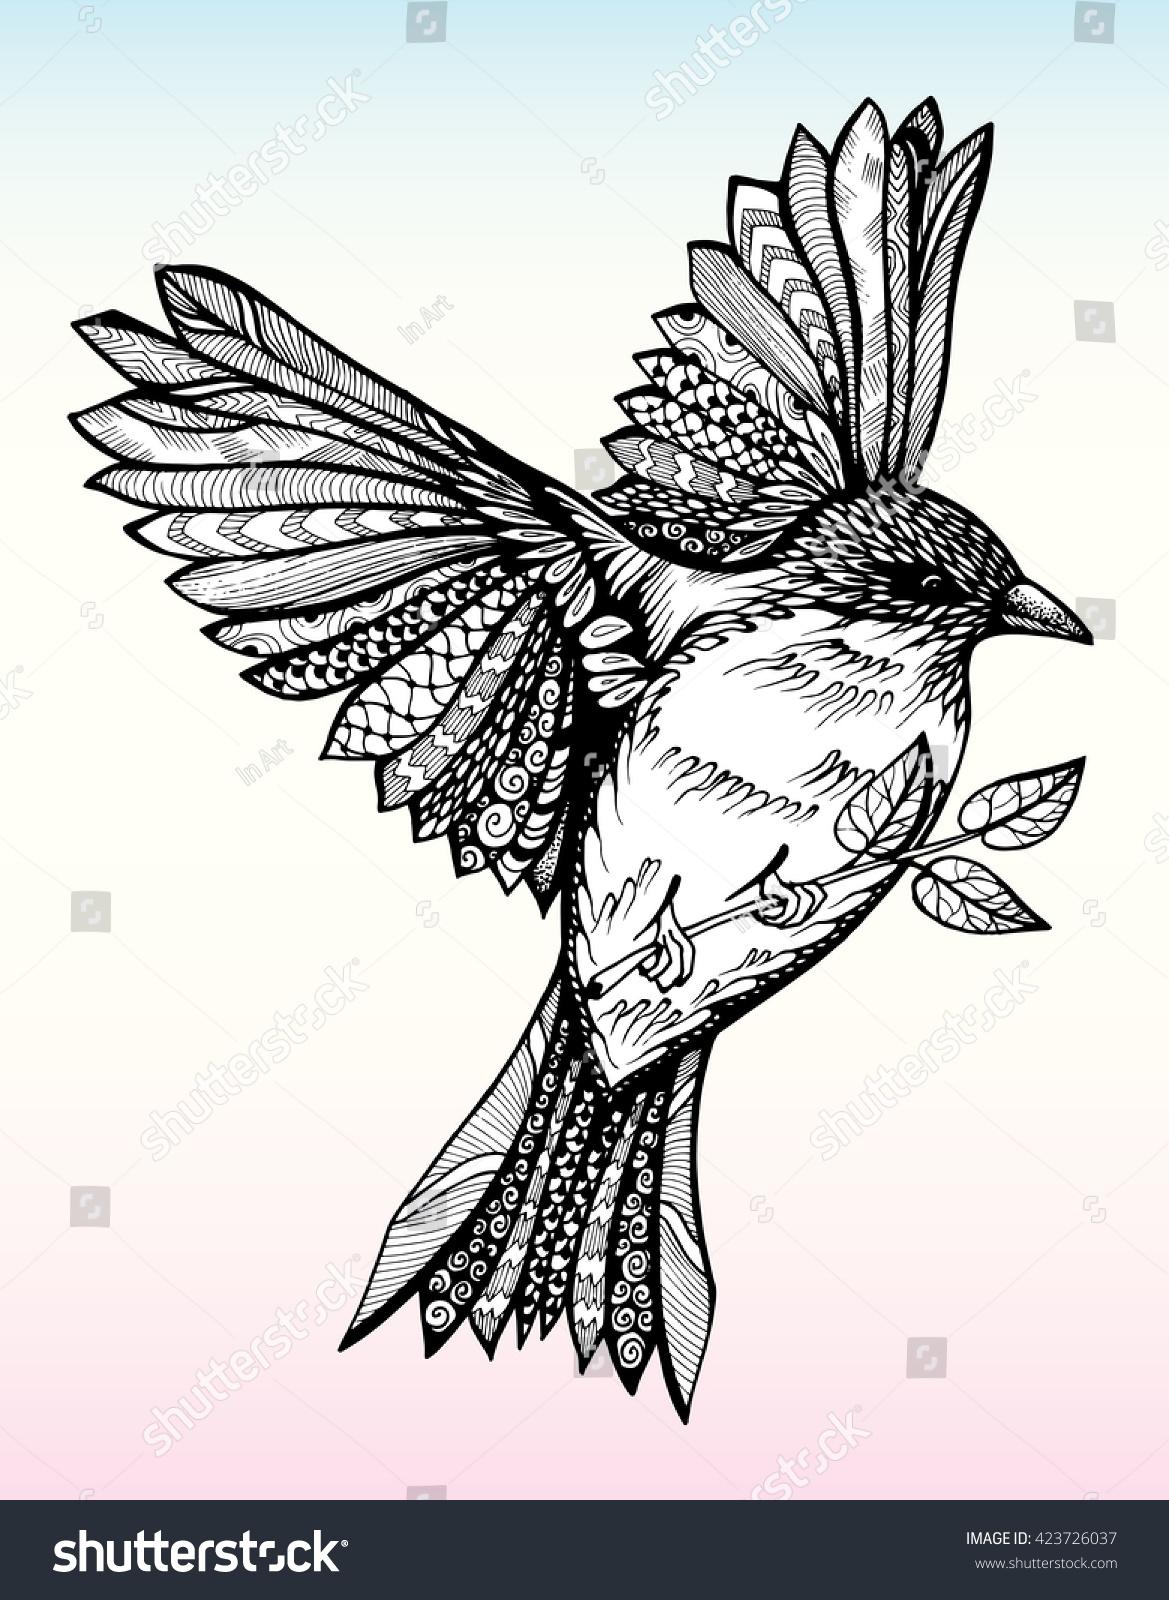 Pin Sparrow Bird Drawing on Pinterest